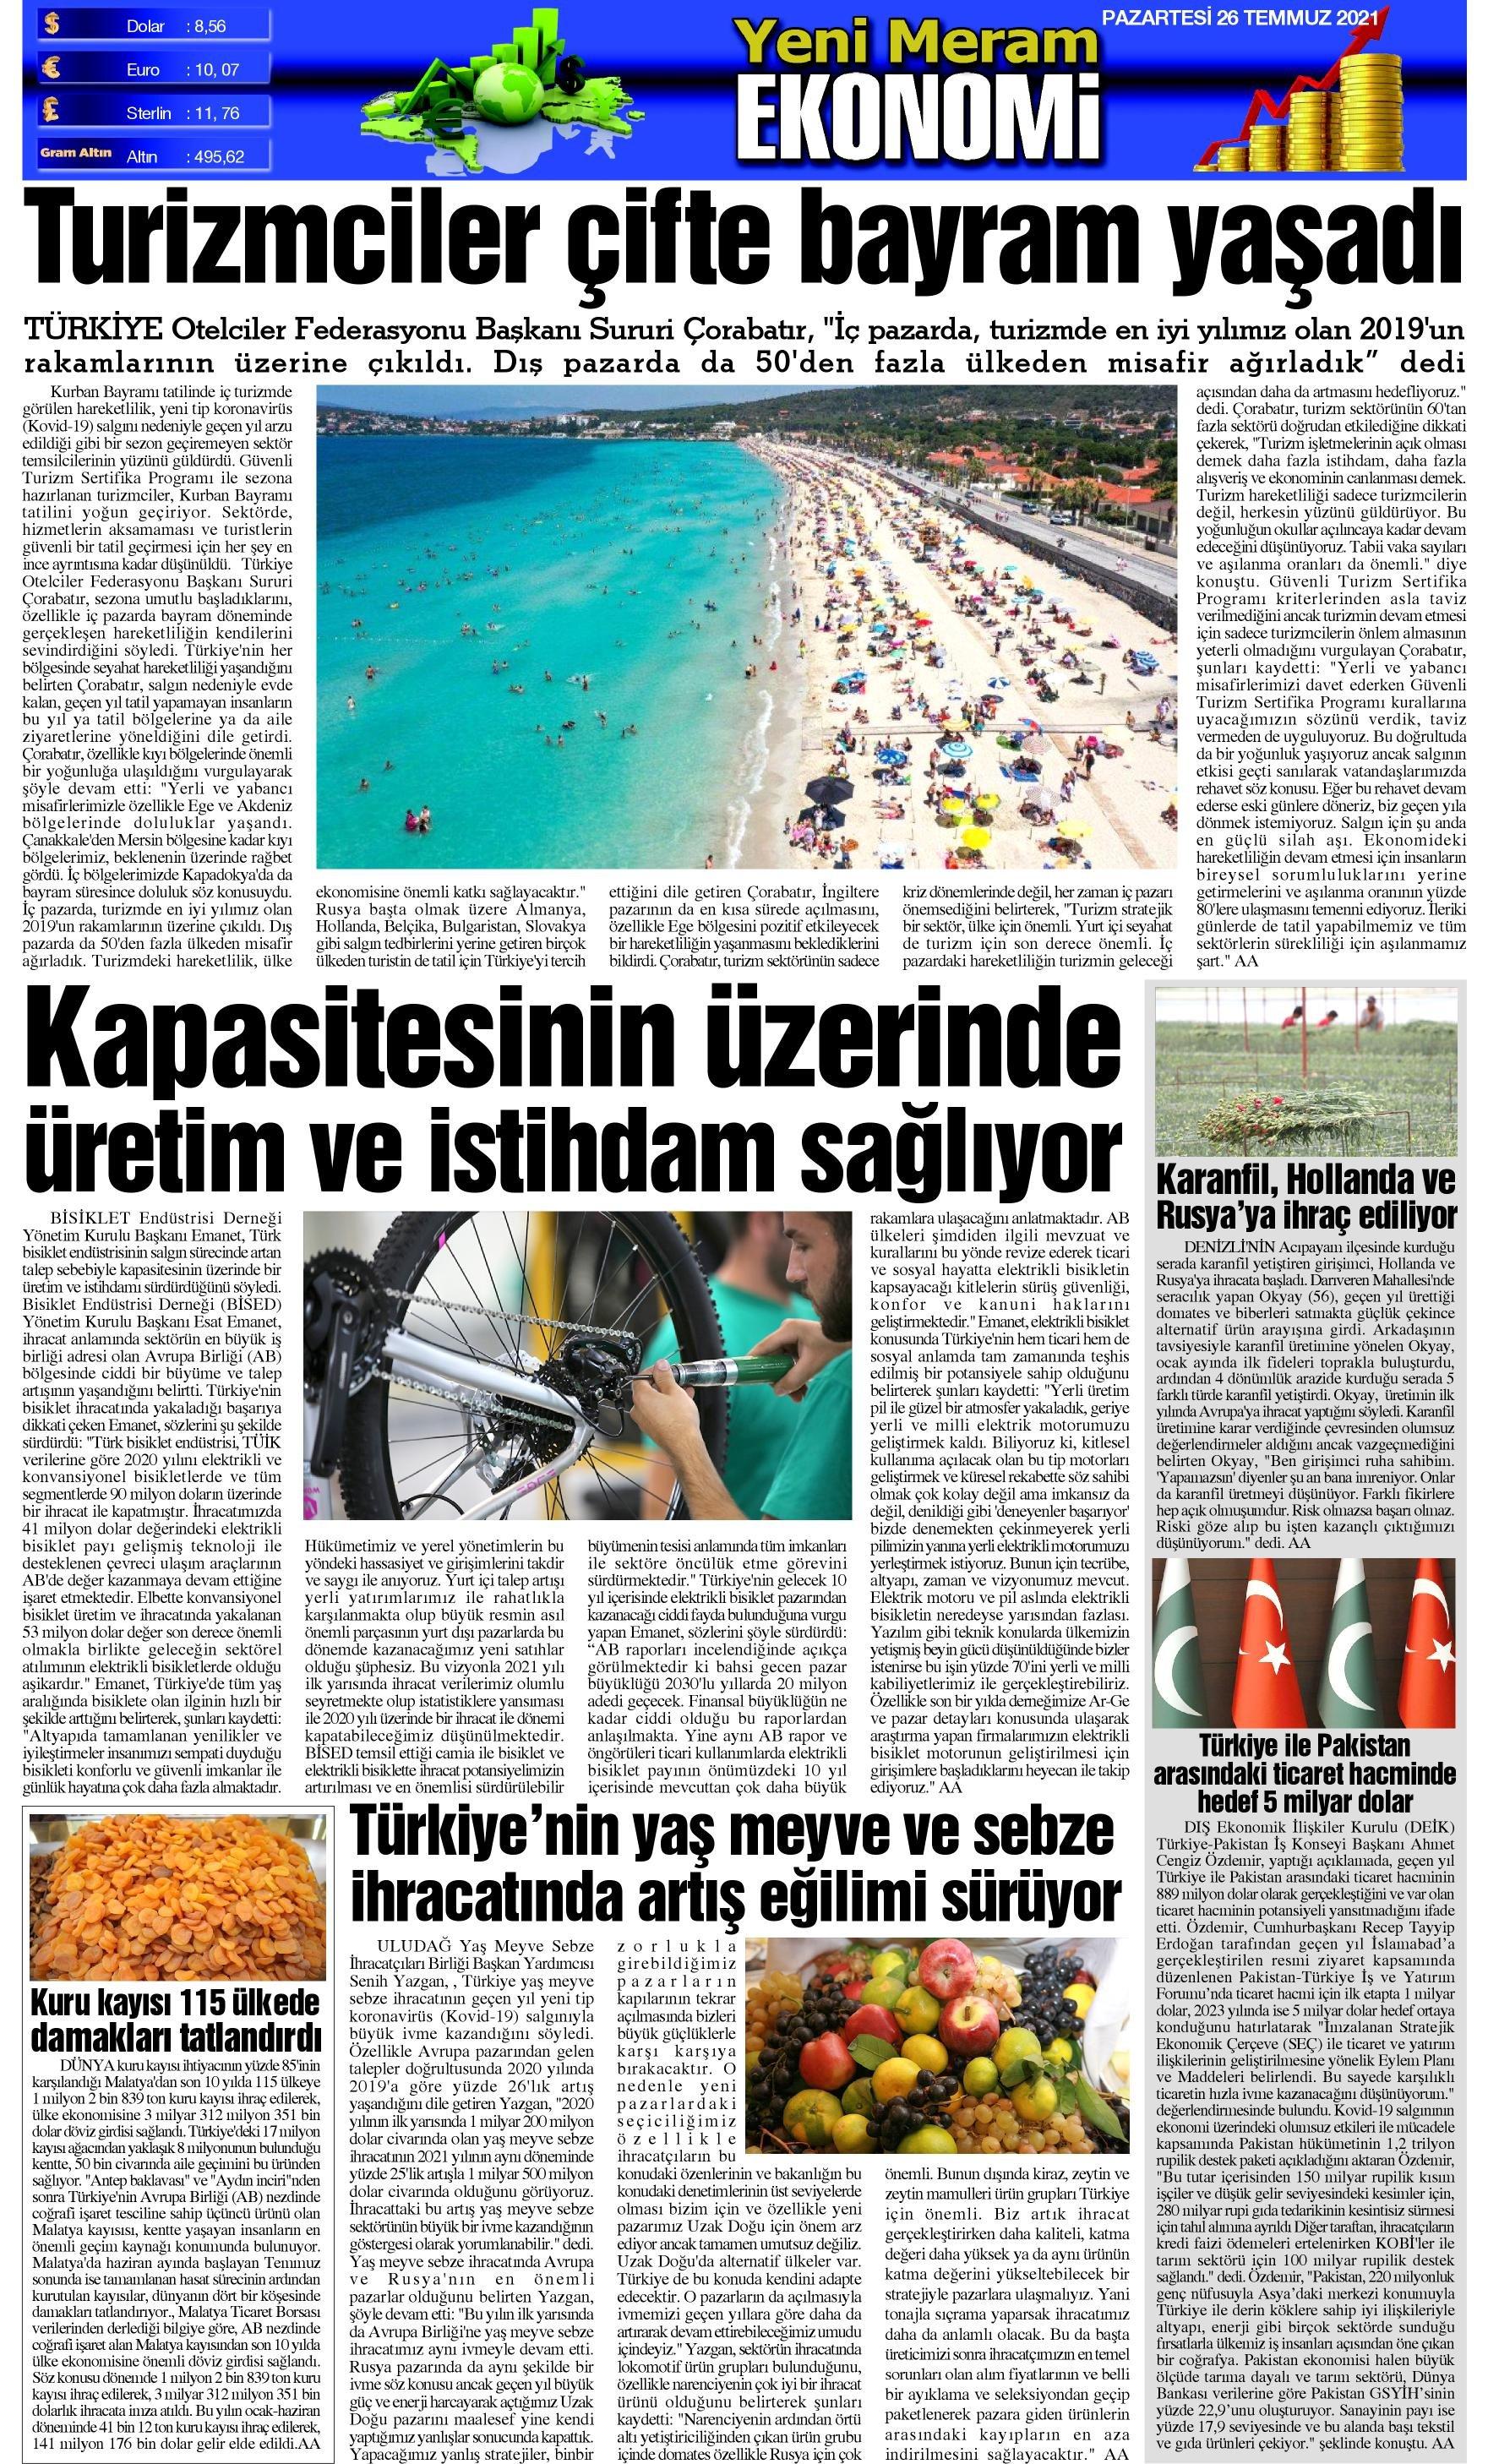 26 Temmuz 2021 Yeni Meram Gazetesi